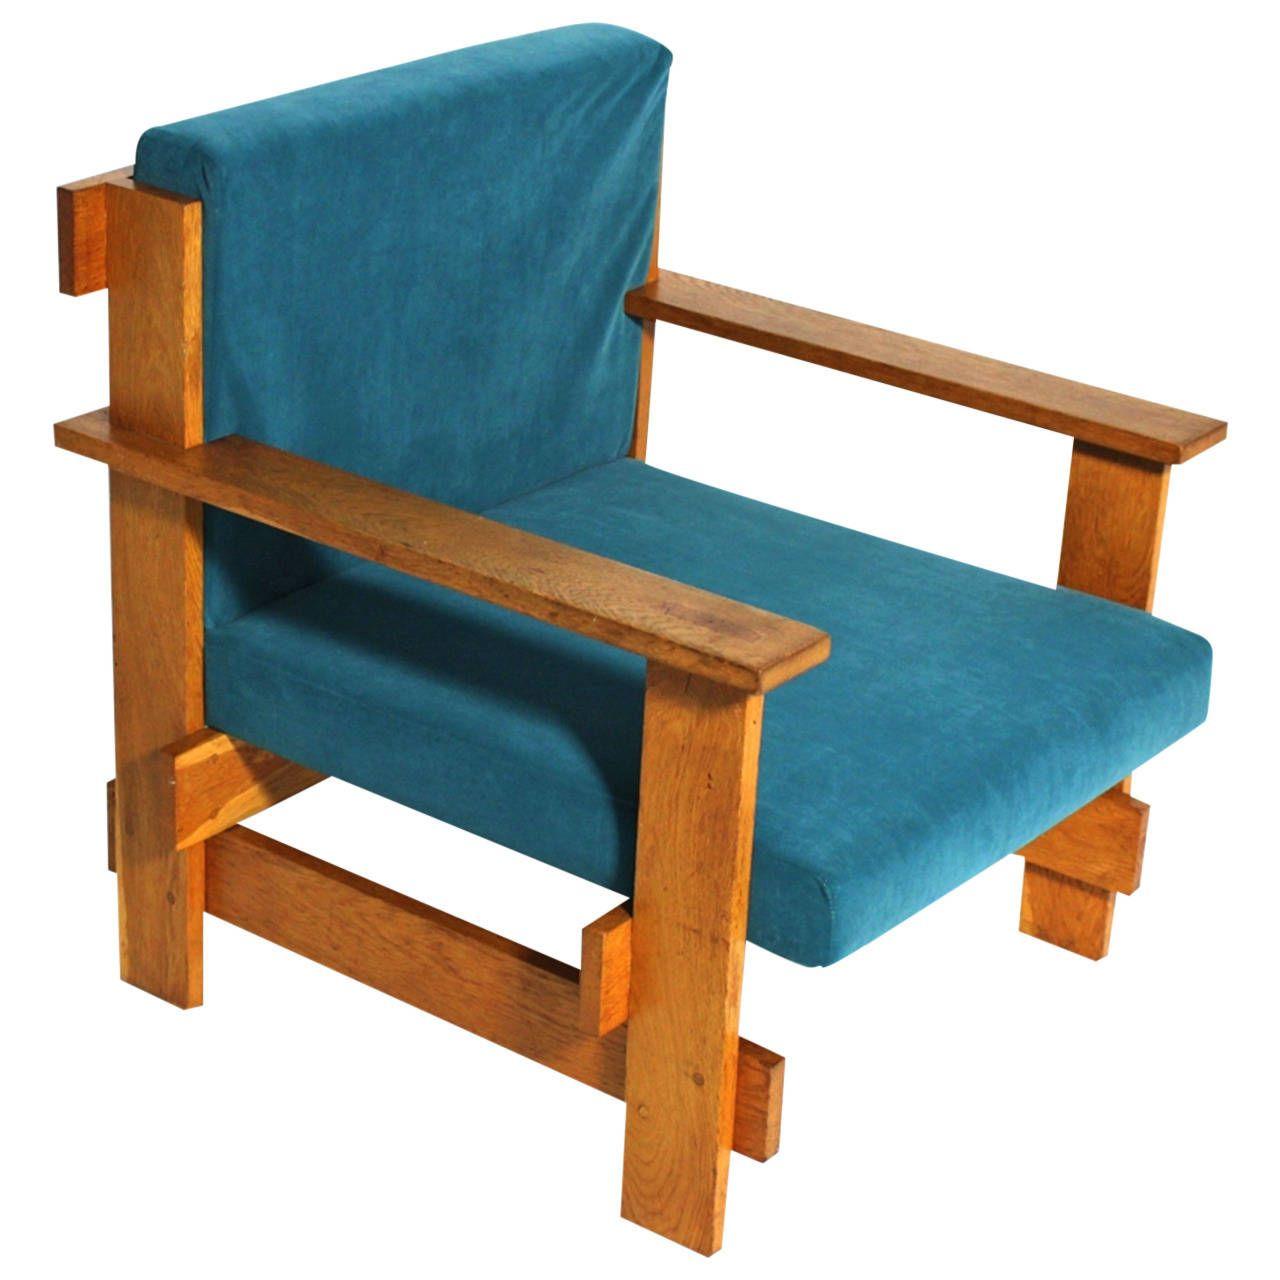 Geometric Bauhaus Lounge Chair in the Style of Josef